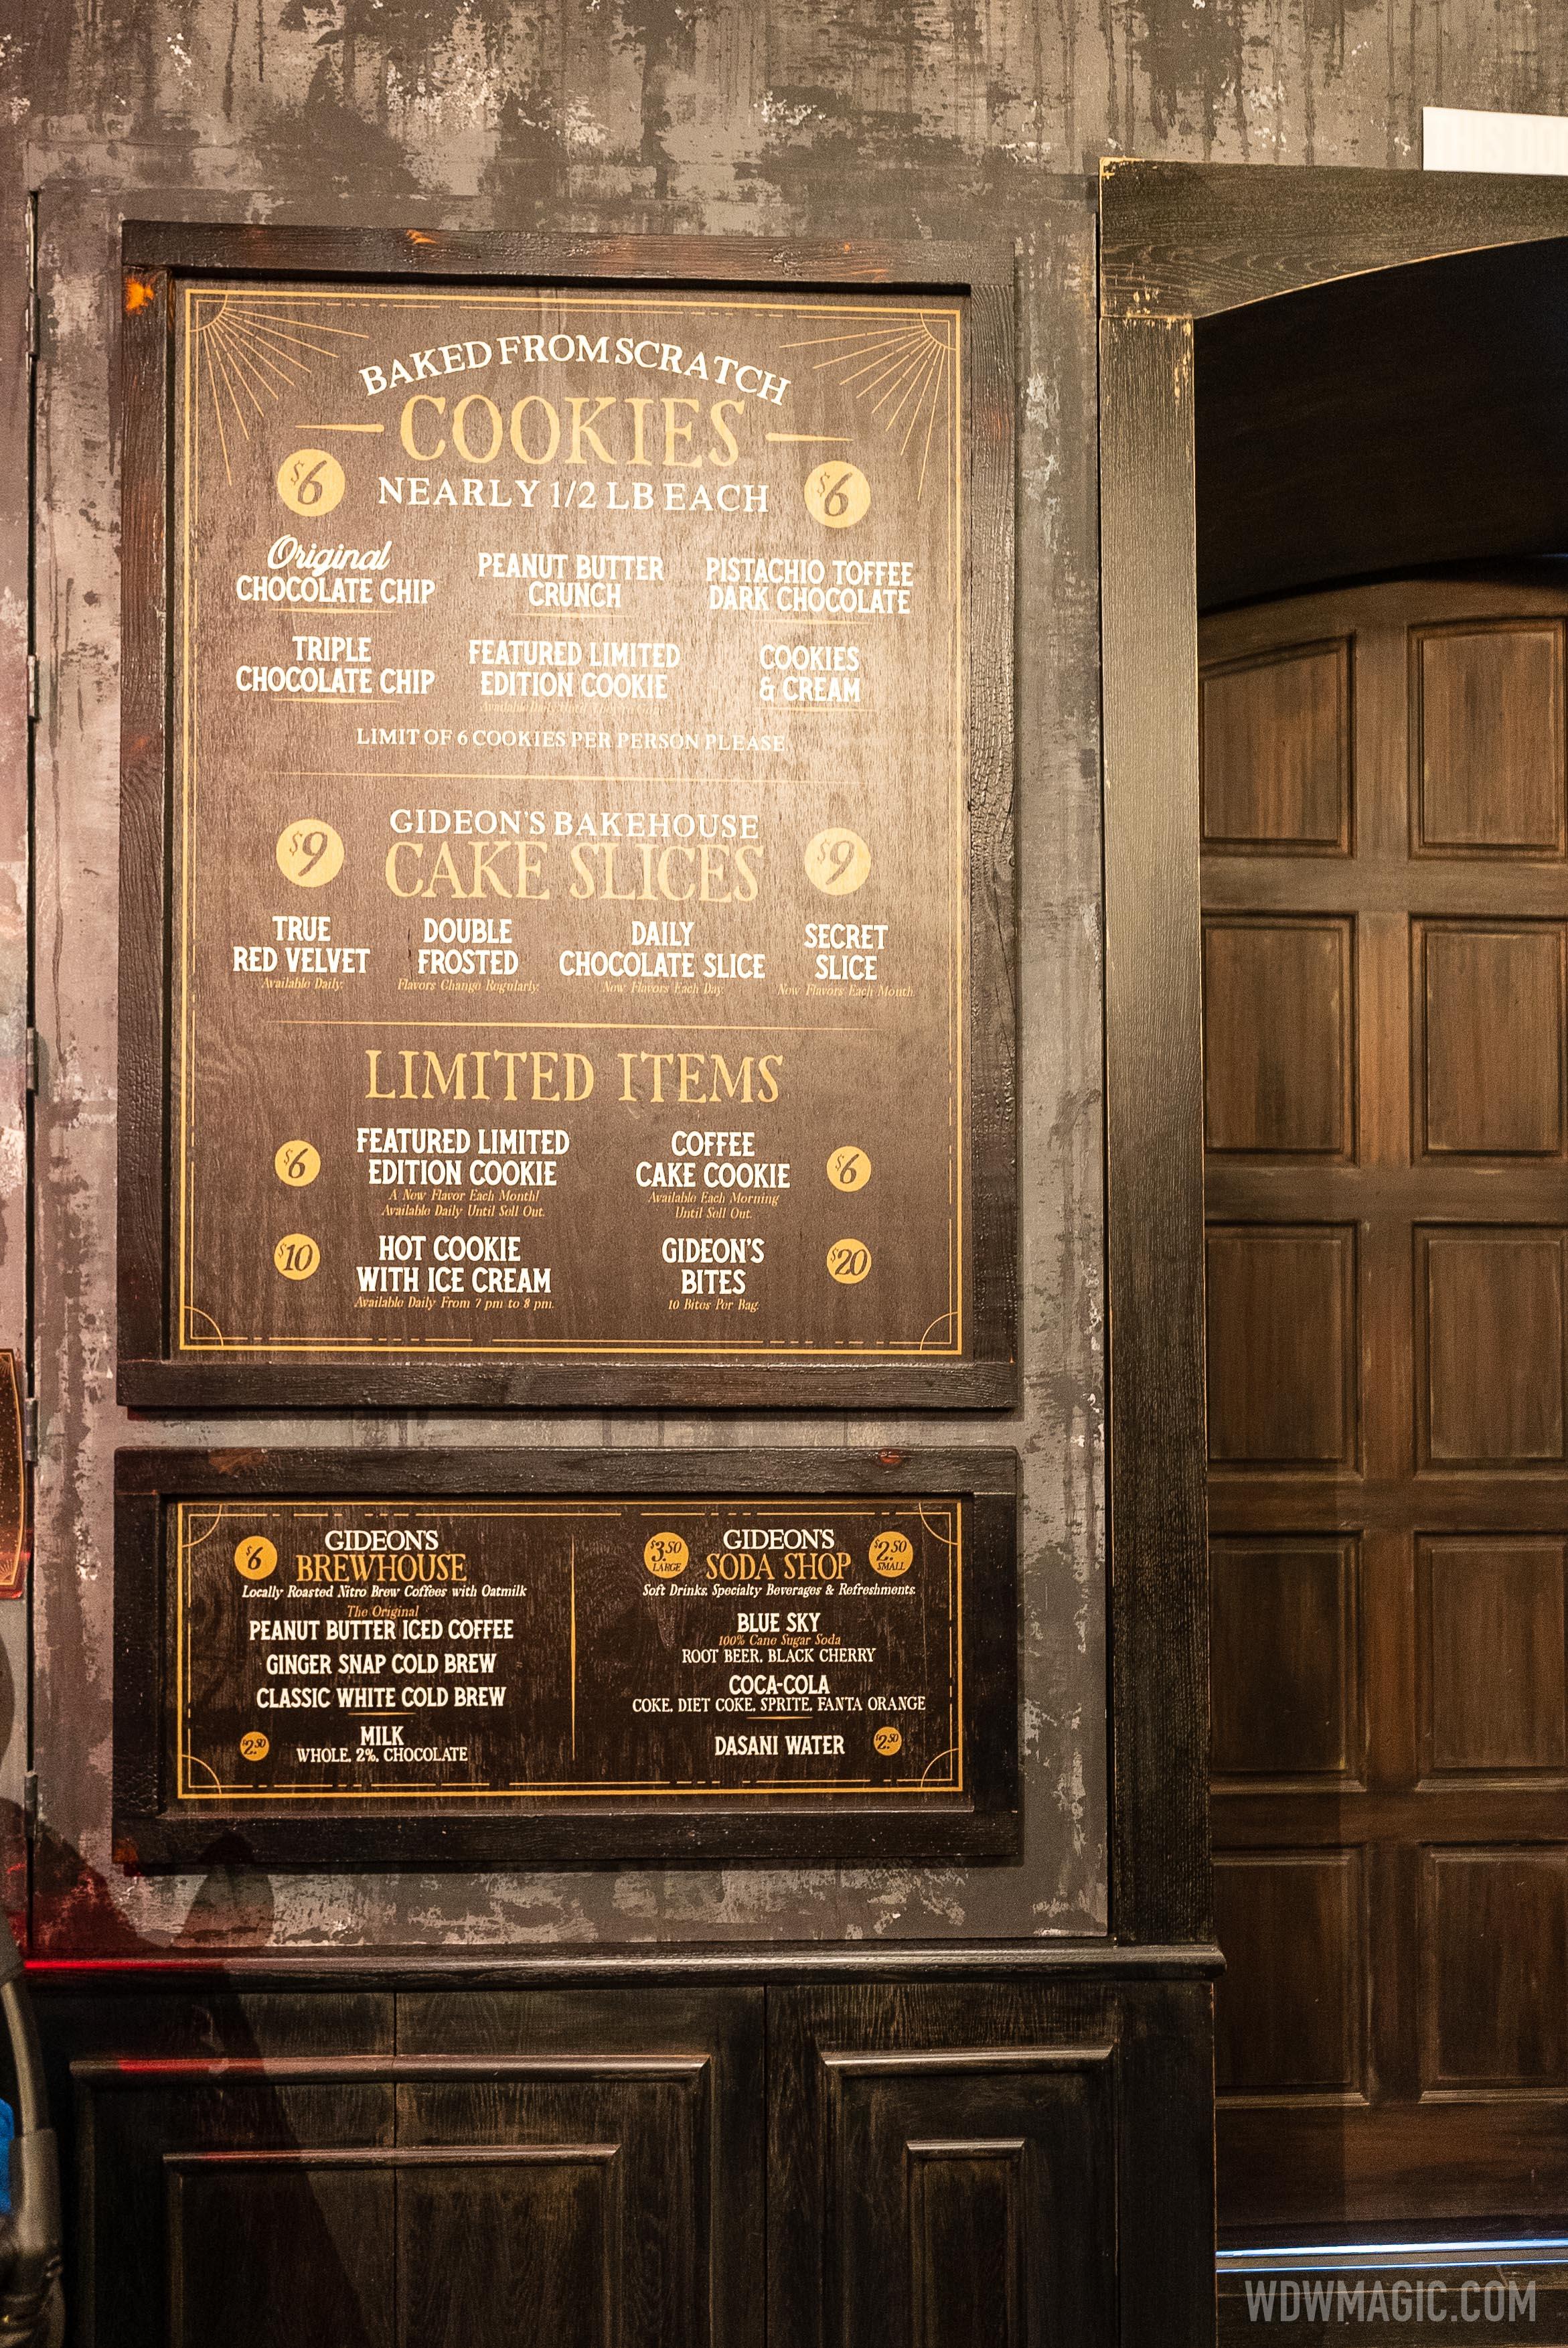 Gideon's Bakehouse Disney Springs menu